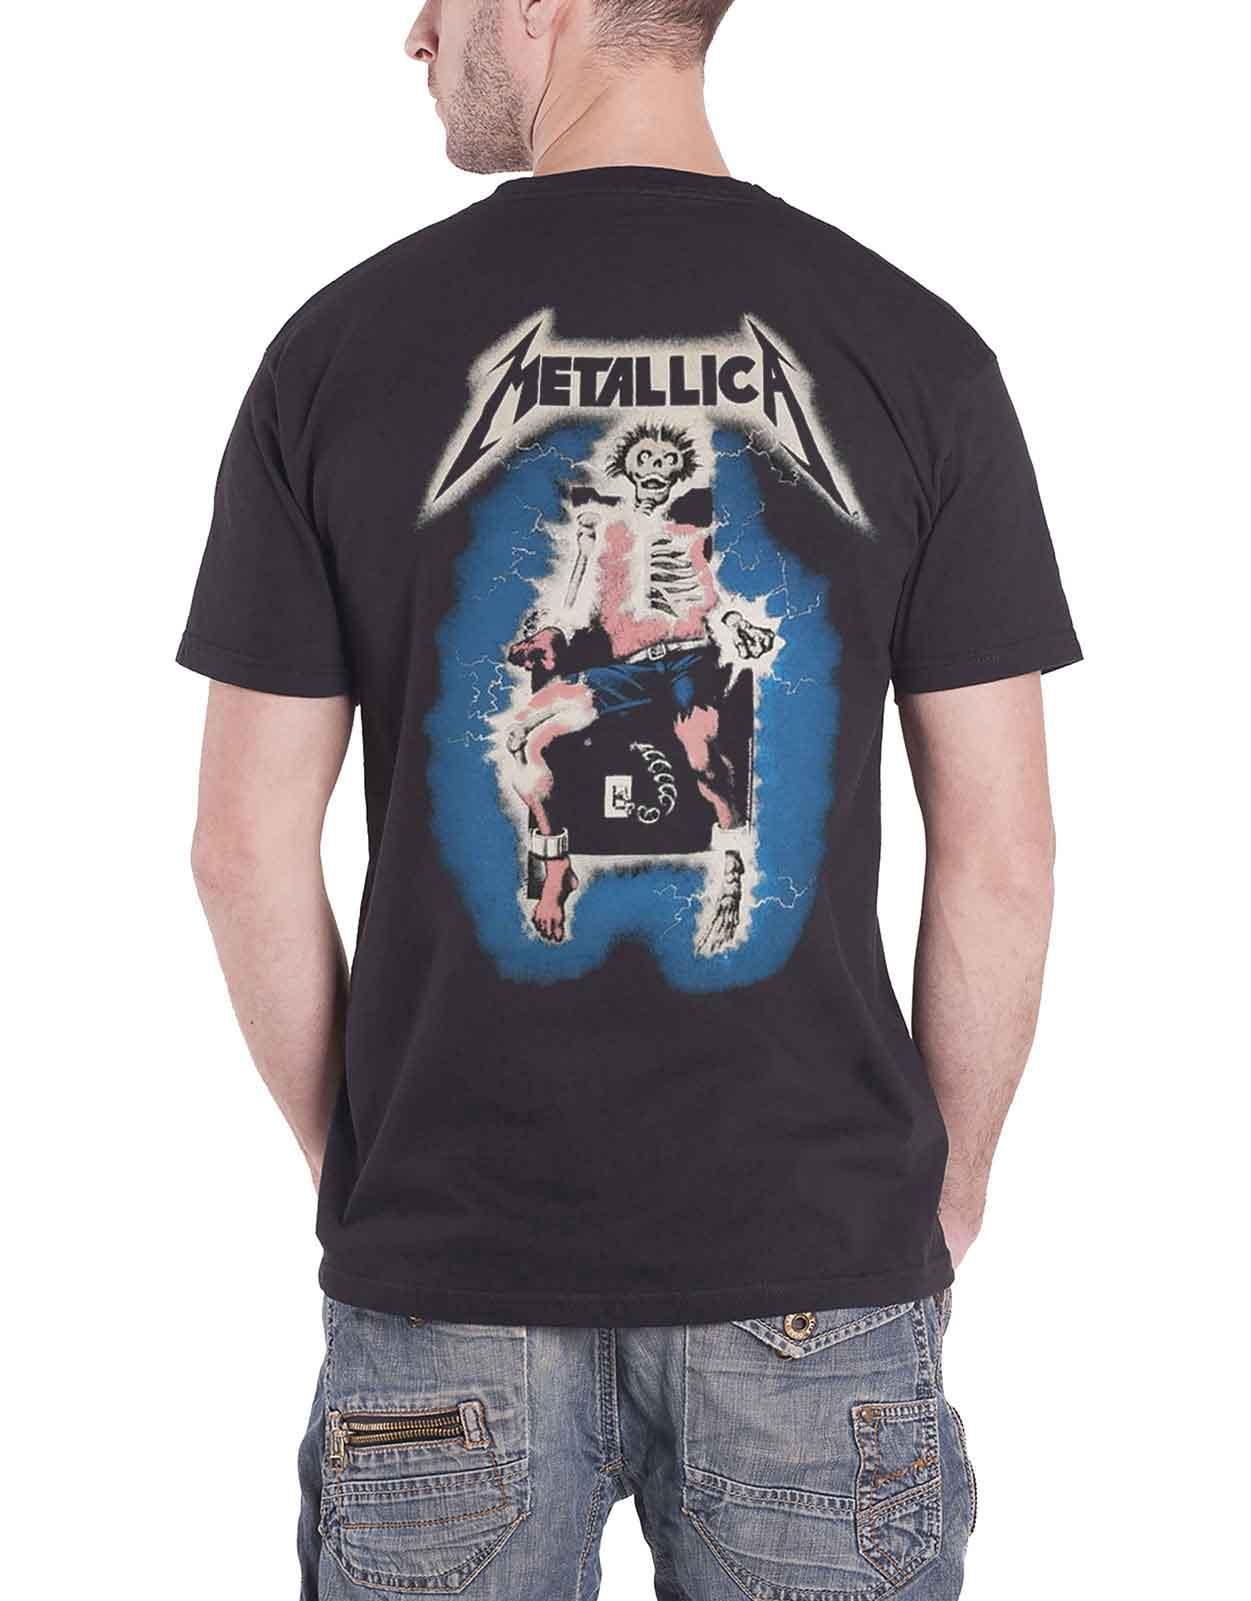 Officiel-Metallica-T-shirt-filaire-justice-for-all-RTL-Band-Logo-Homme-Nouveau miniature 43